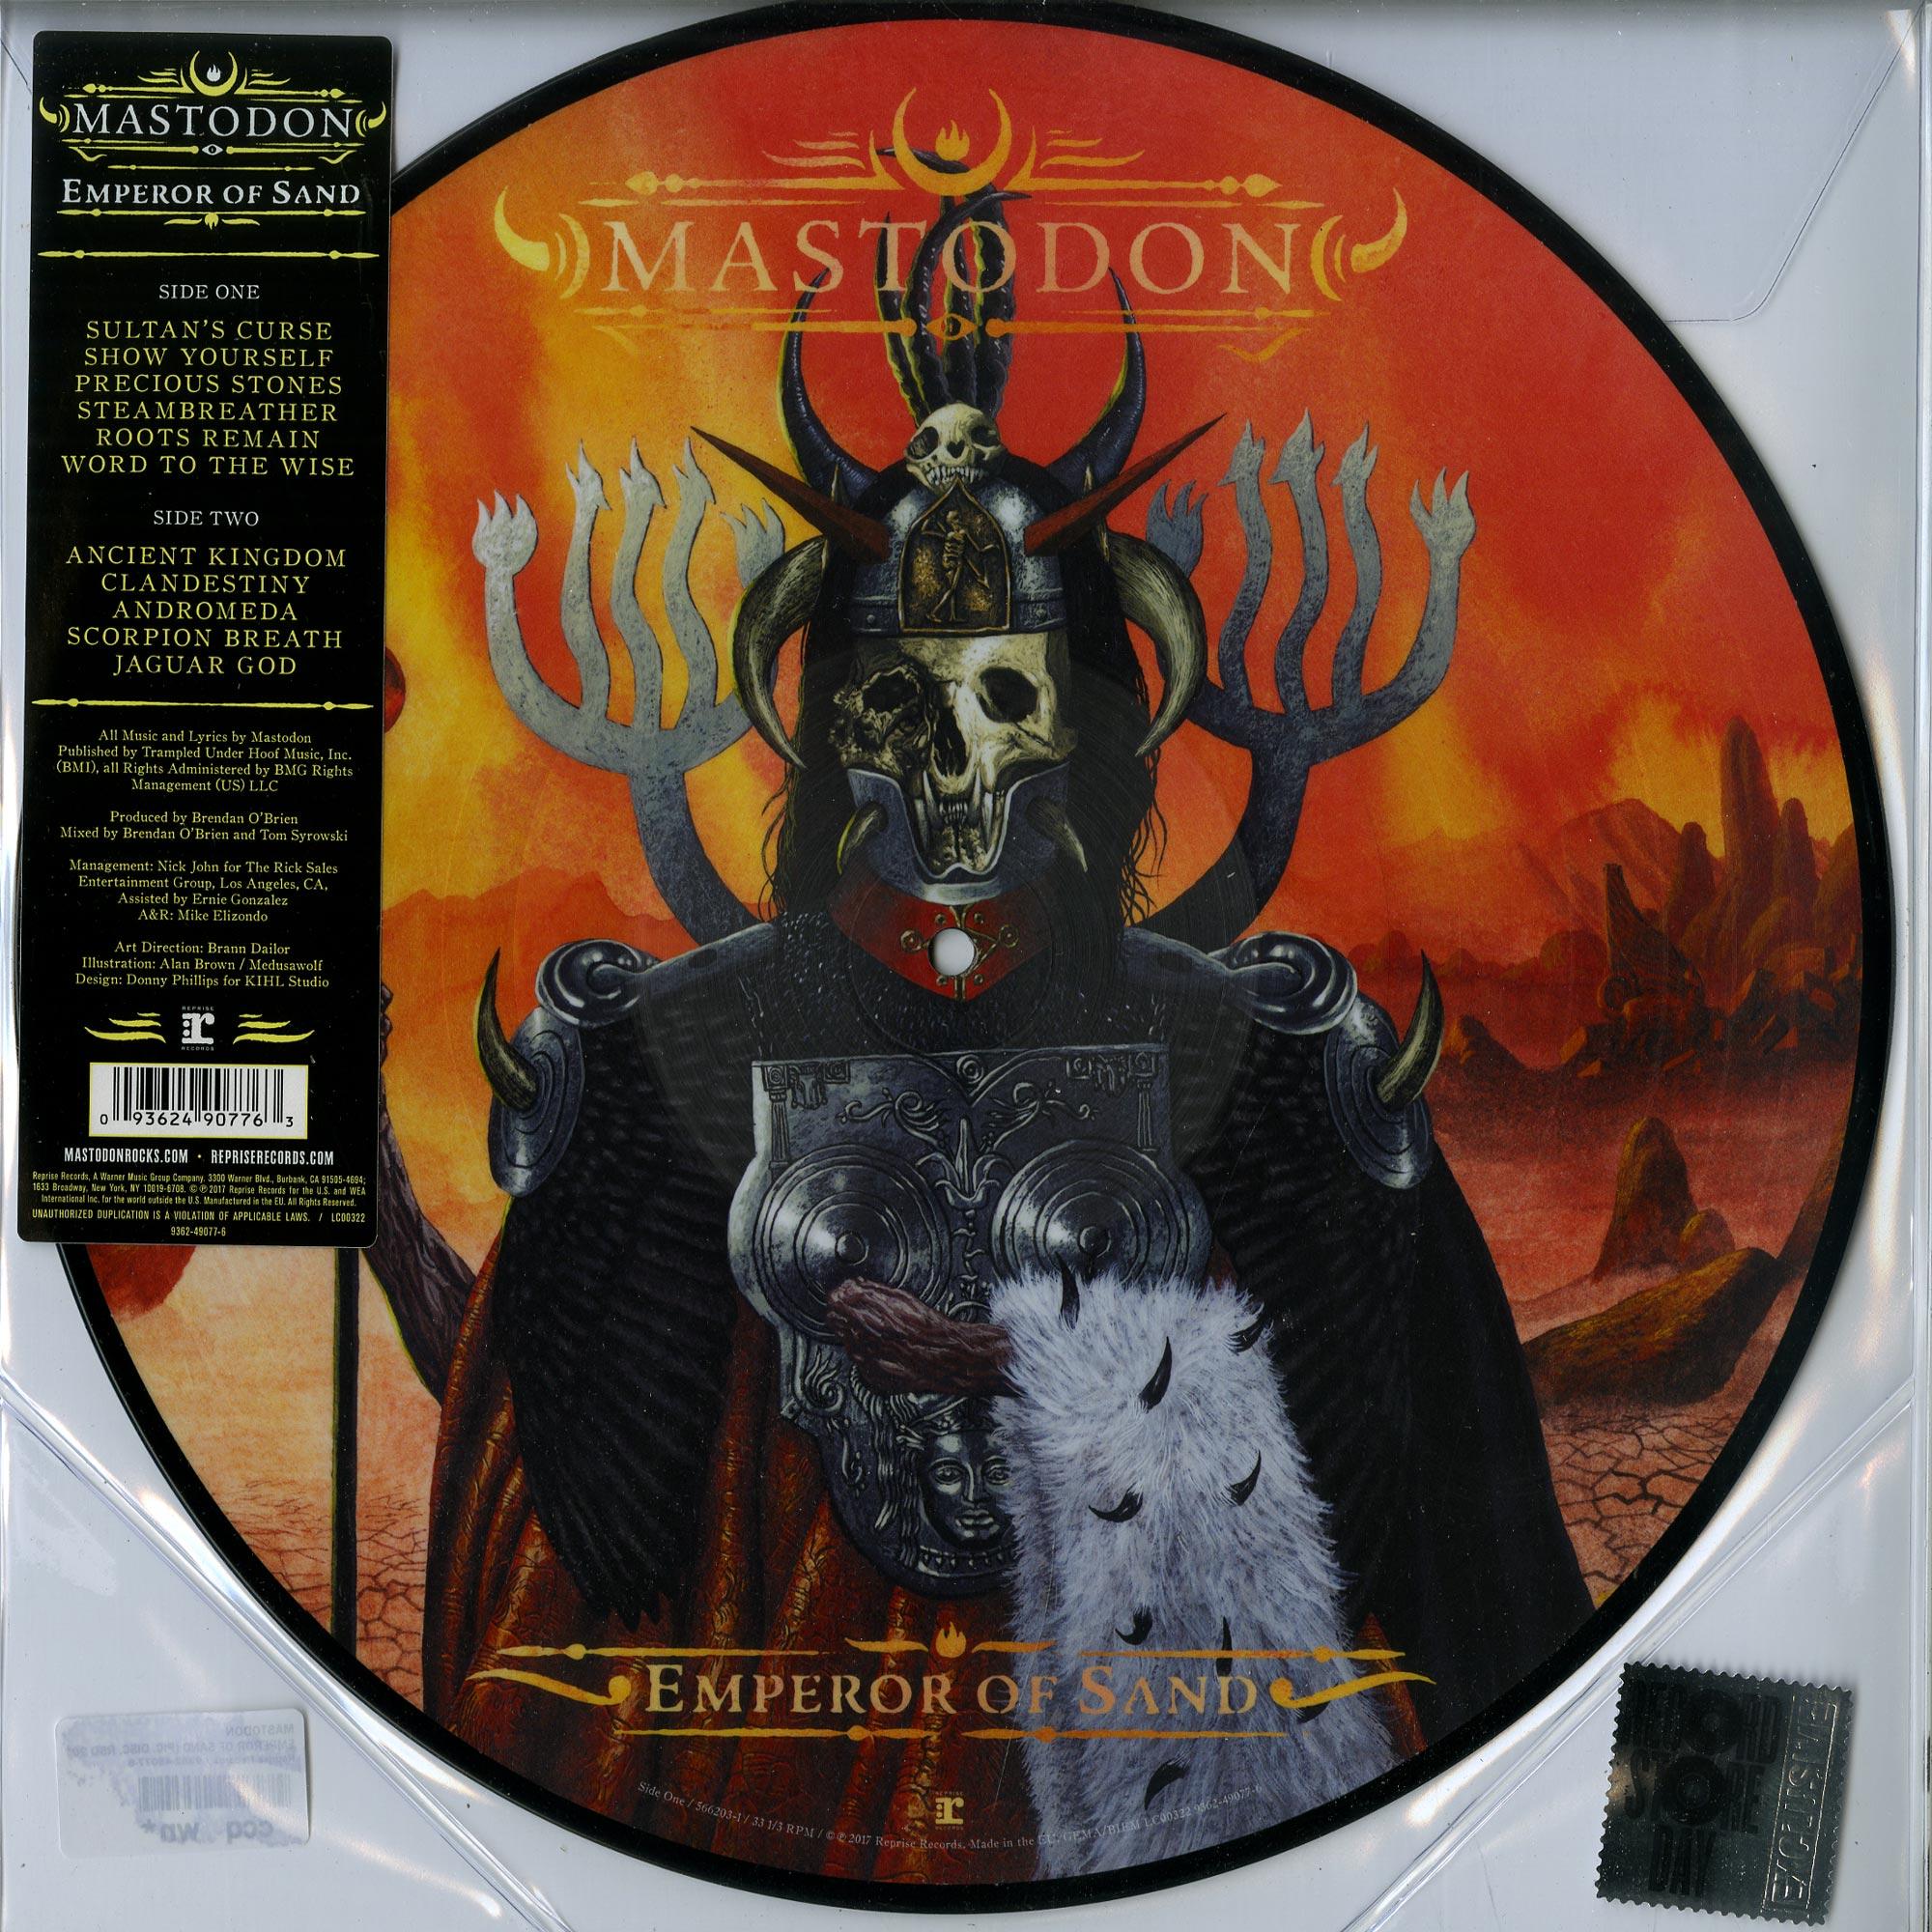 Mastodon - EMPEROR OF SAND